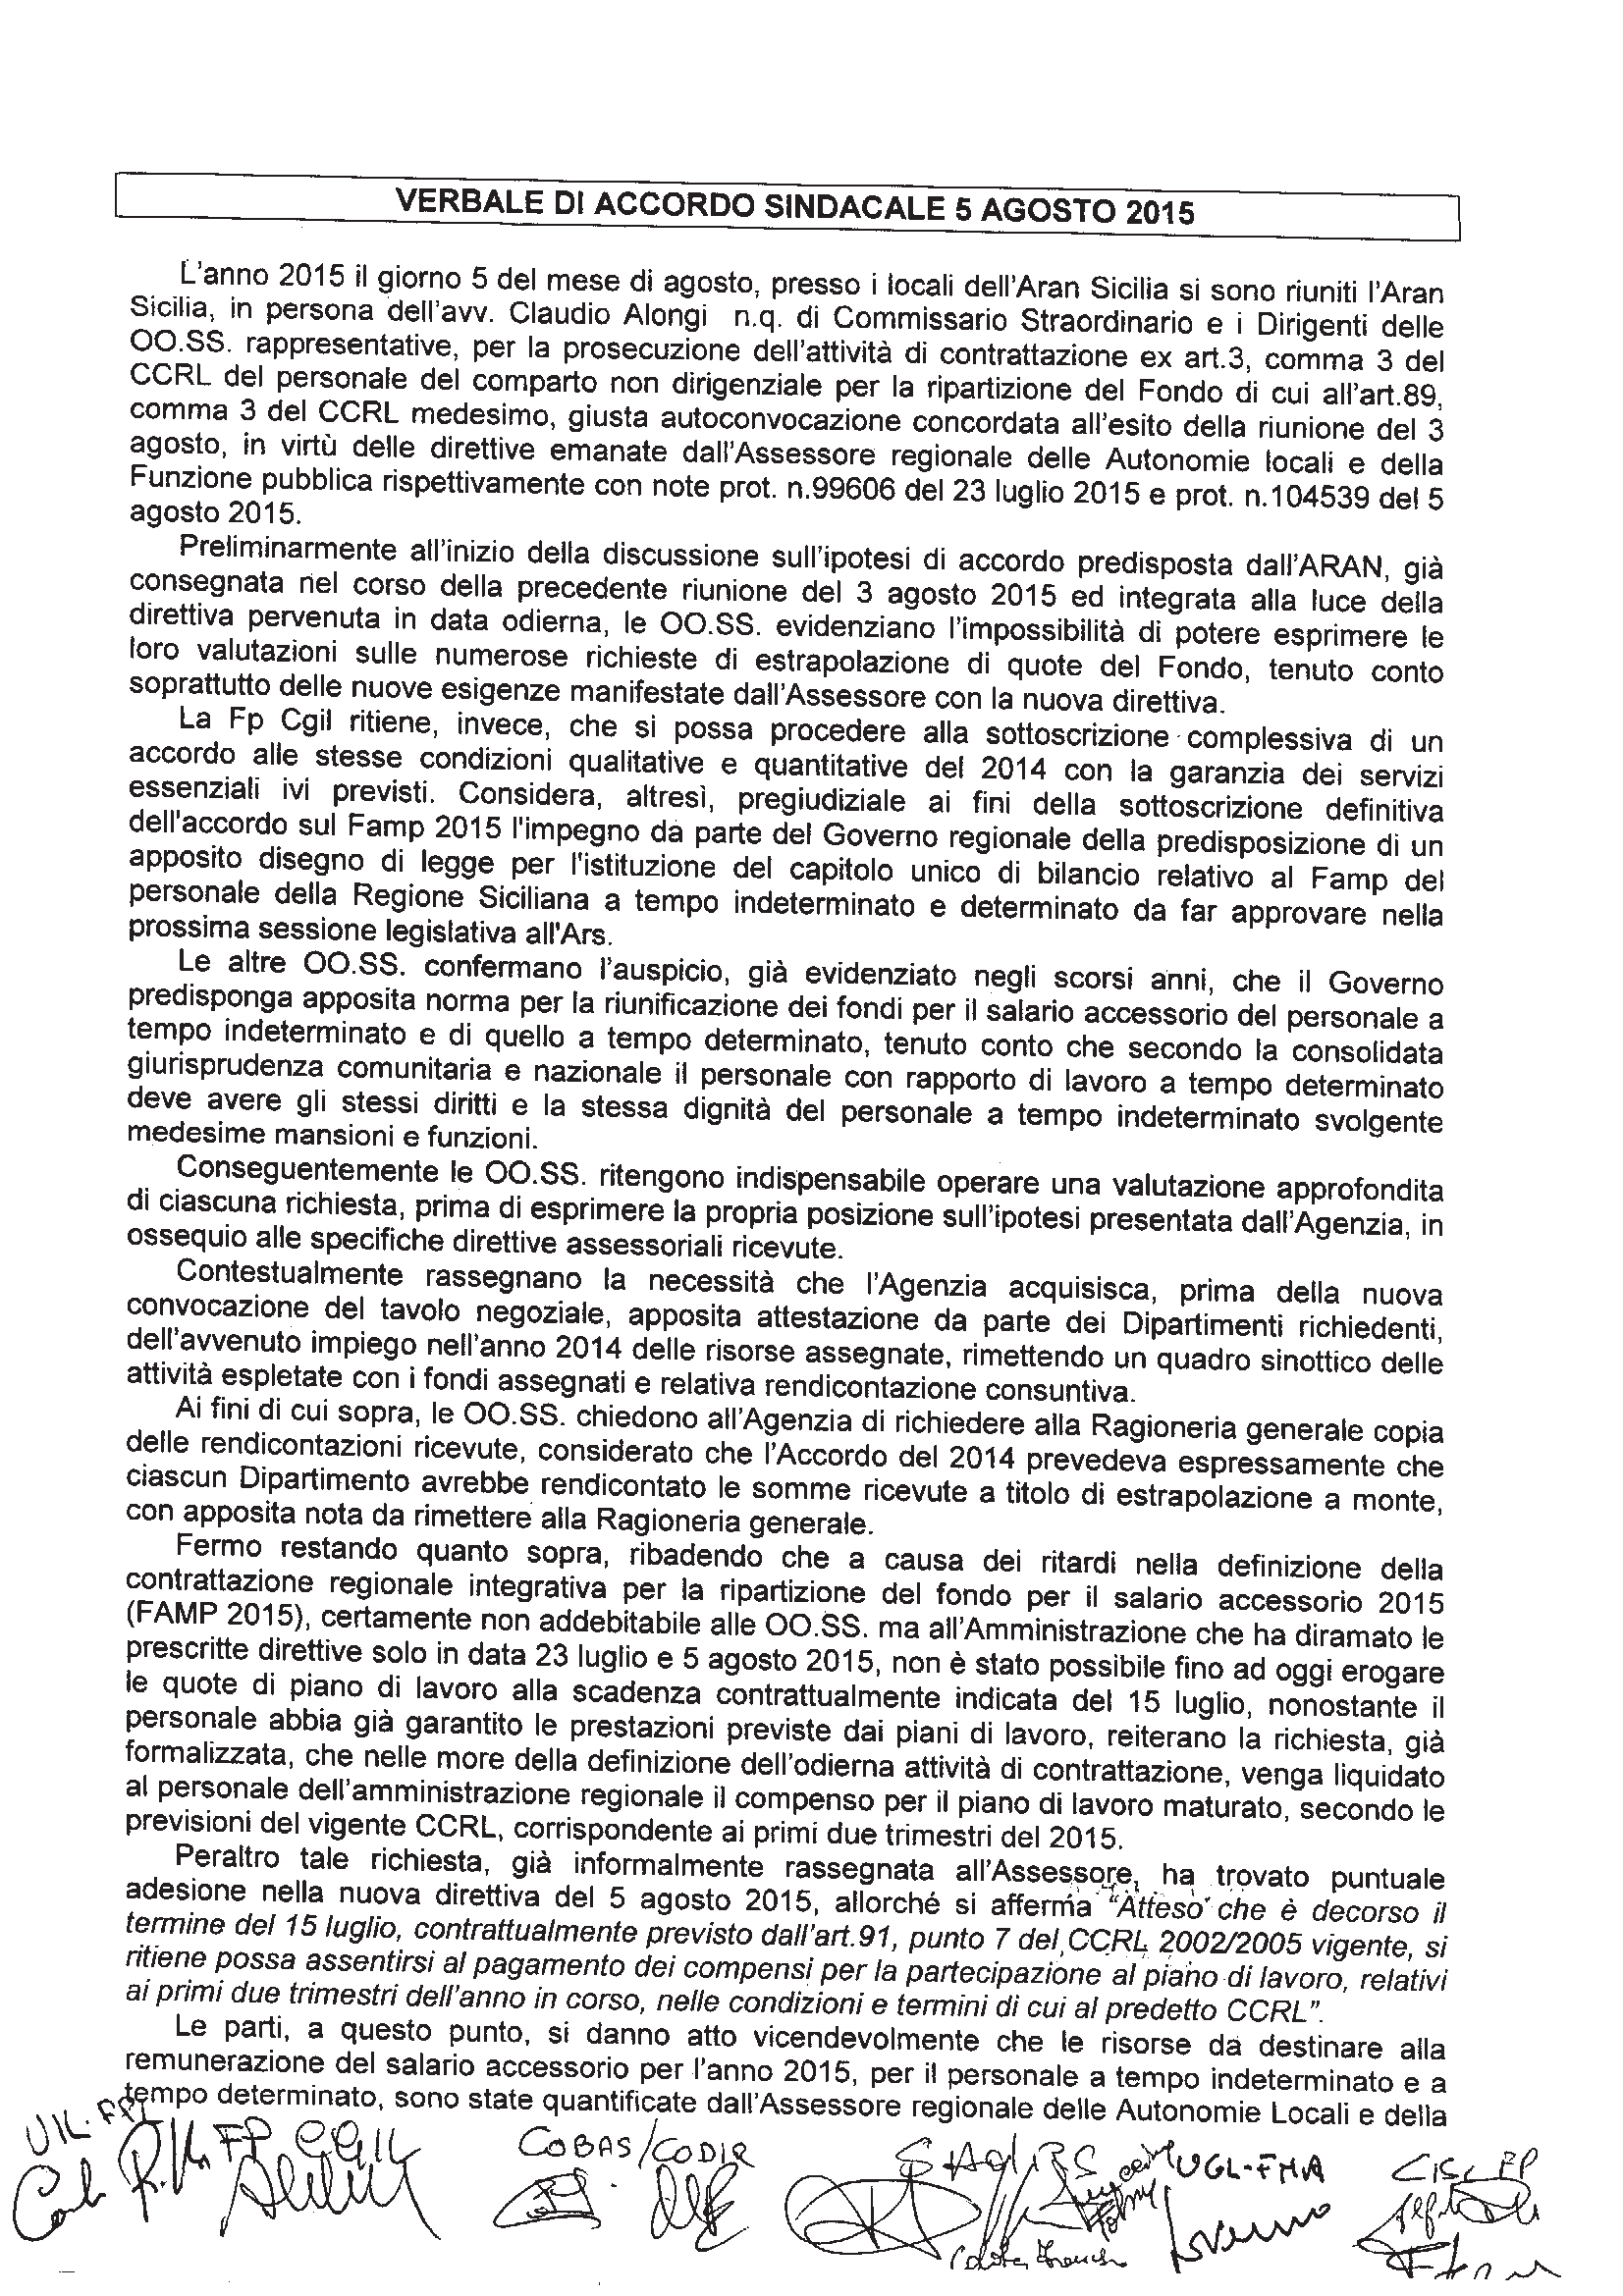 accordo famp 2015